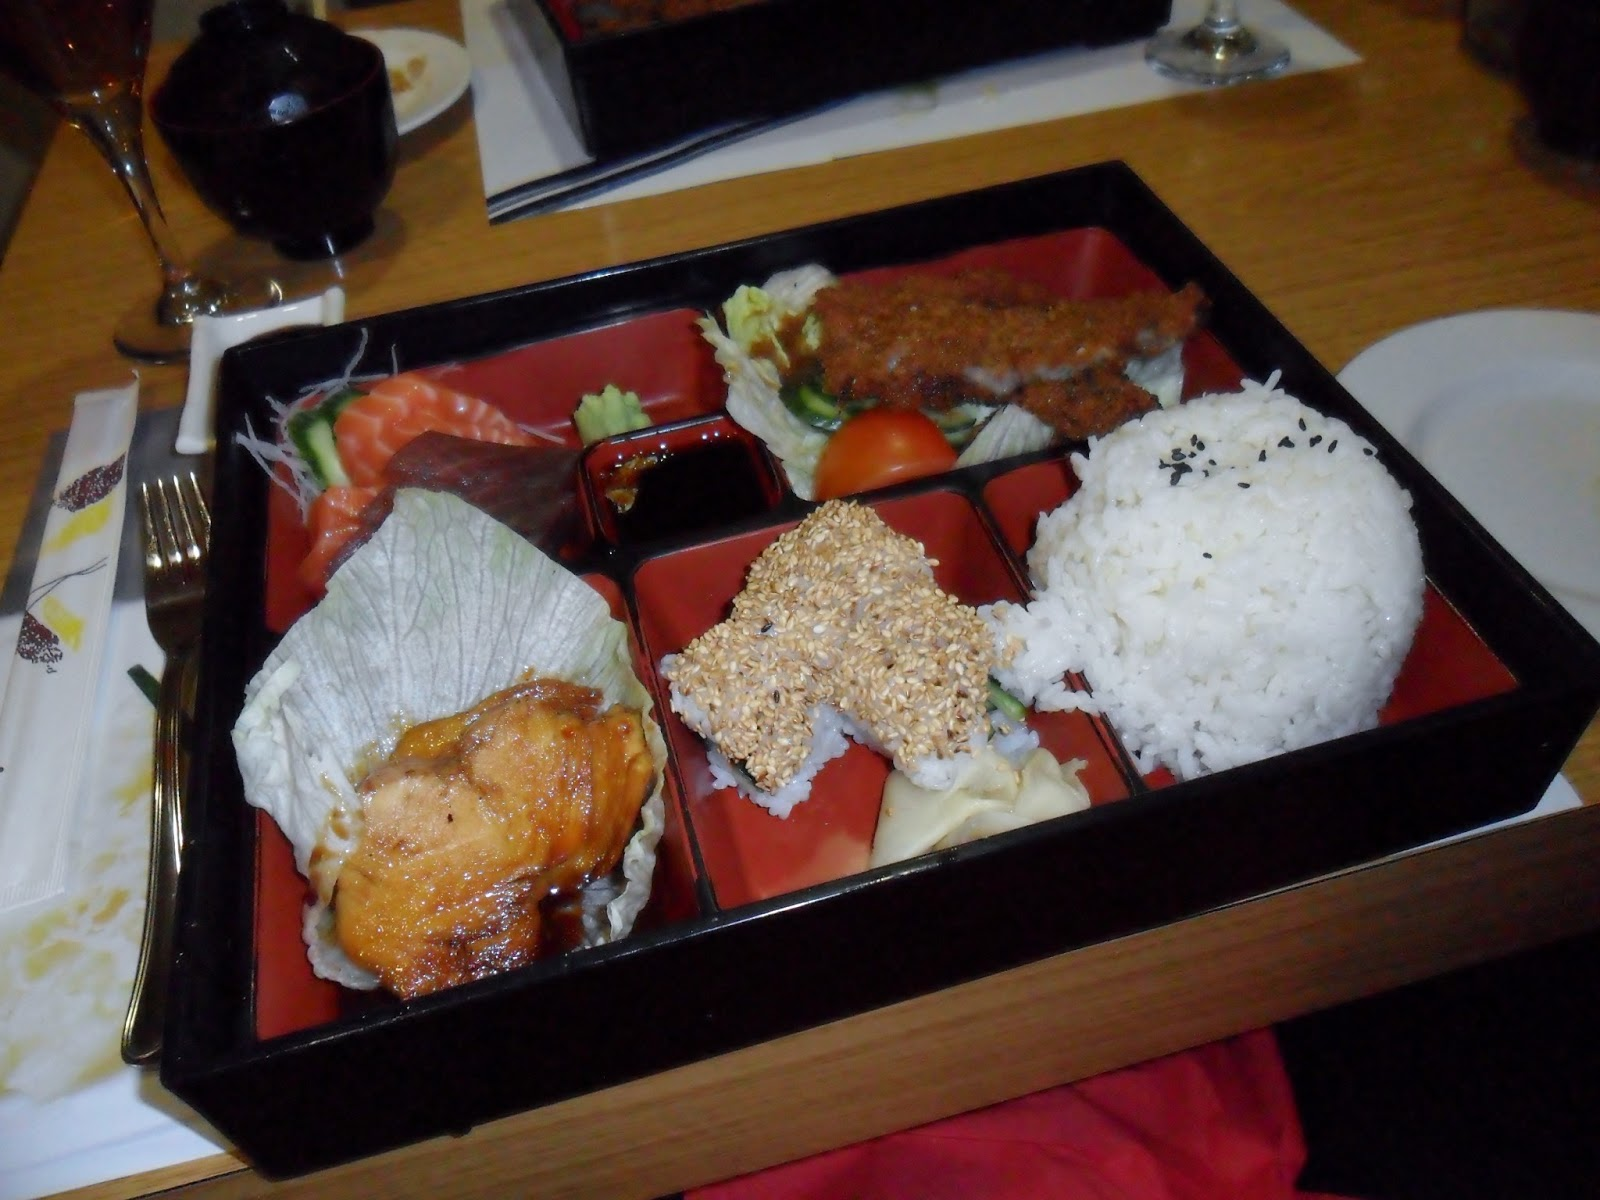 Tenkaichi Bento Box, Tenkaichi Sushi Bar, Cardiff